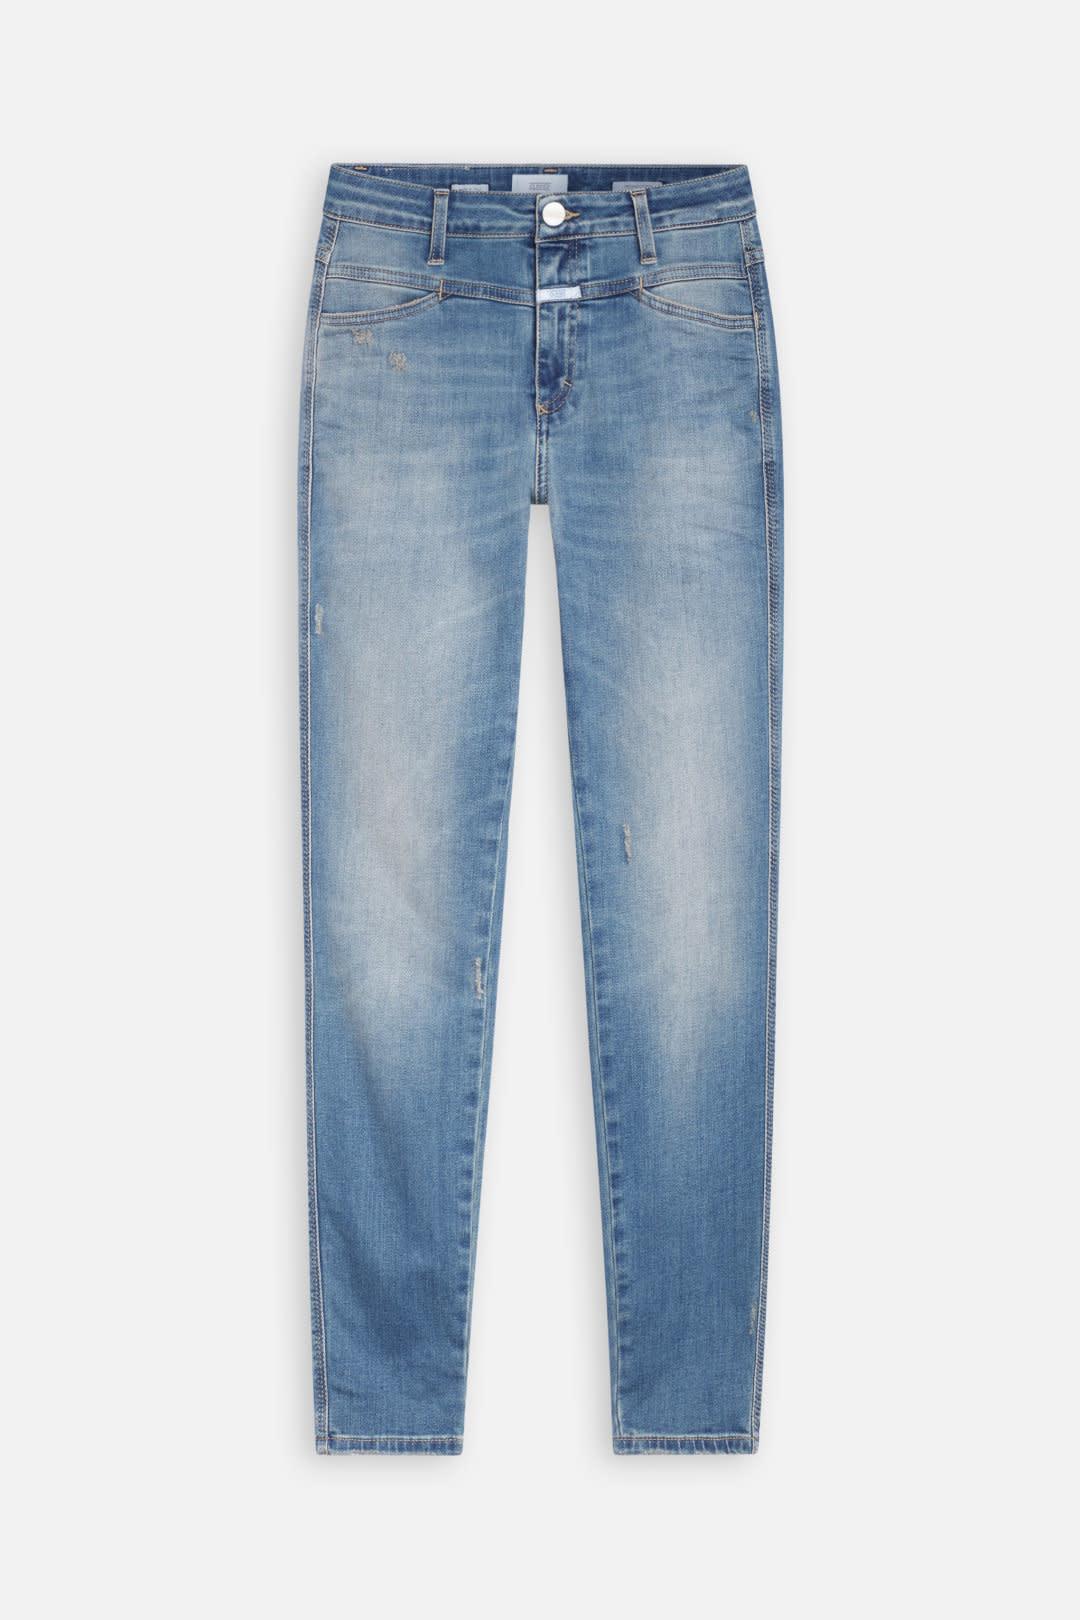 Skinny Pusher C91231 mid Blue 04R-2